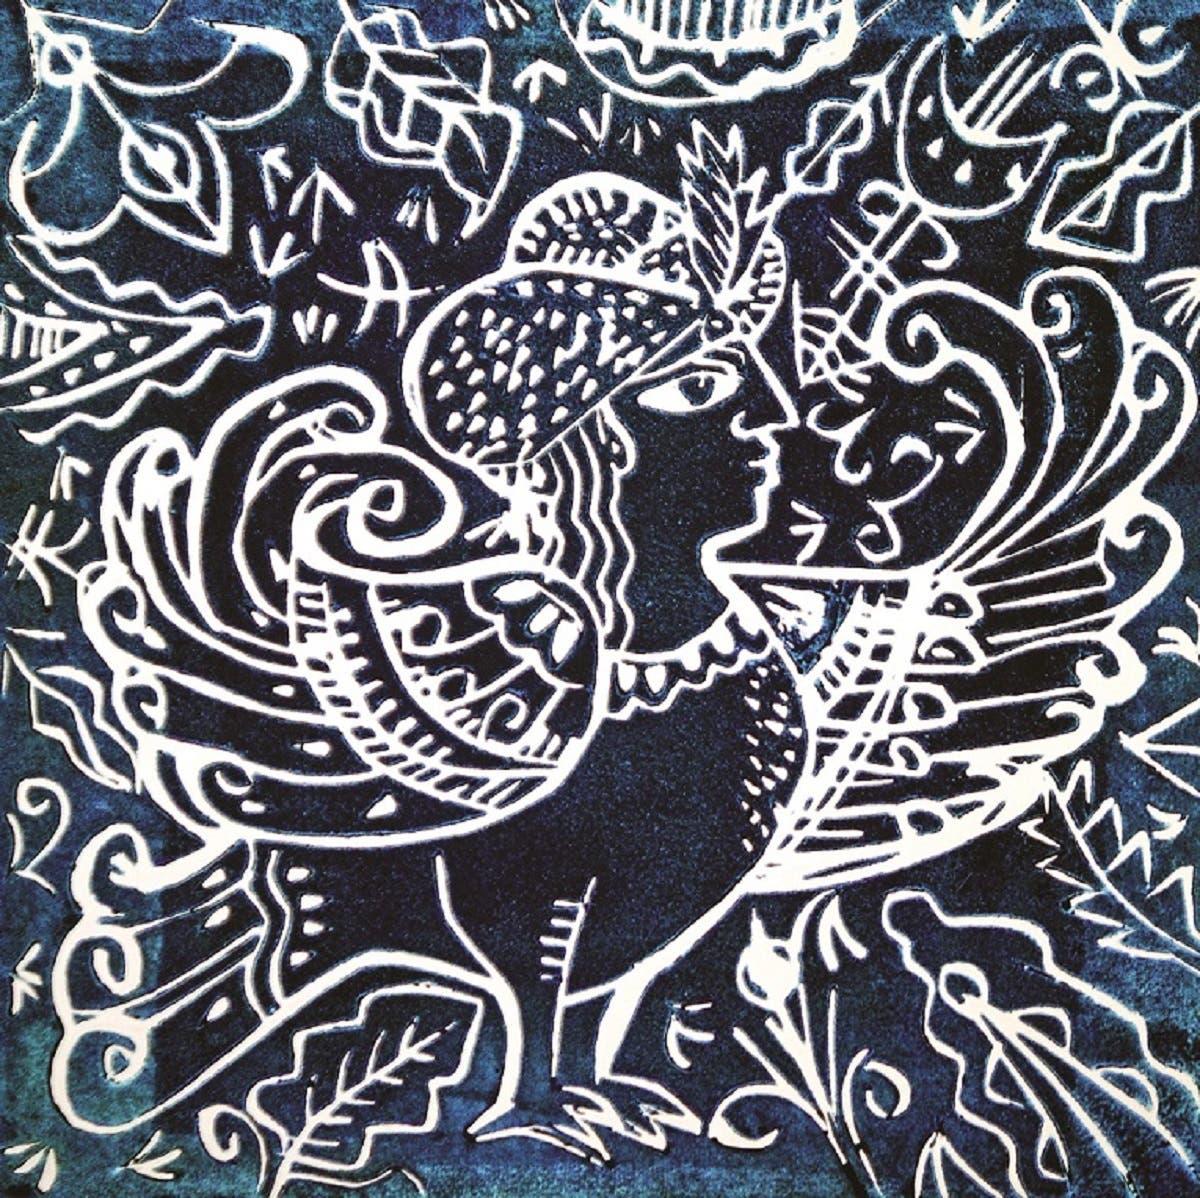 Birds of Paradise II, 1994, (25 x 25 cm); Lino Cut.